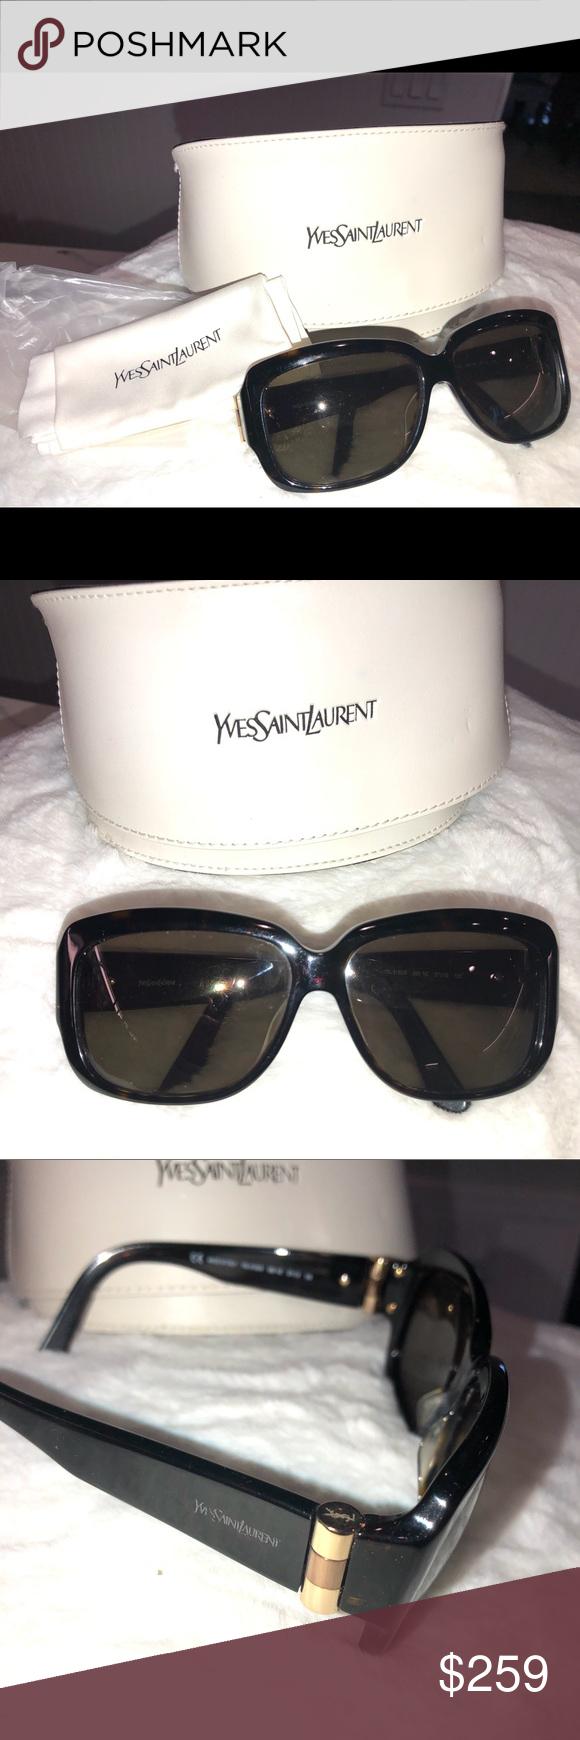 NWOT YSL sunglasses Sunglasses vintage, Ysl sunglasses